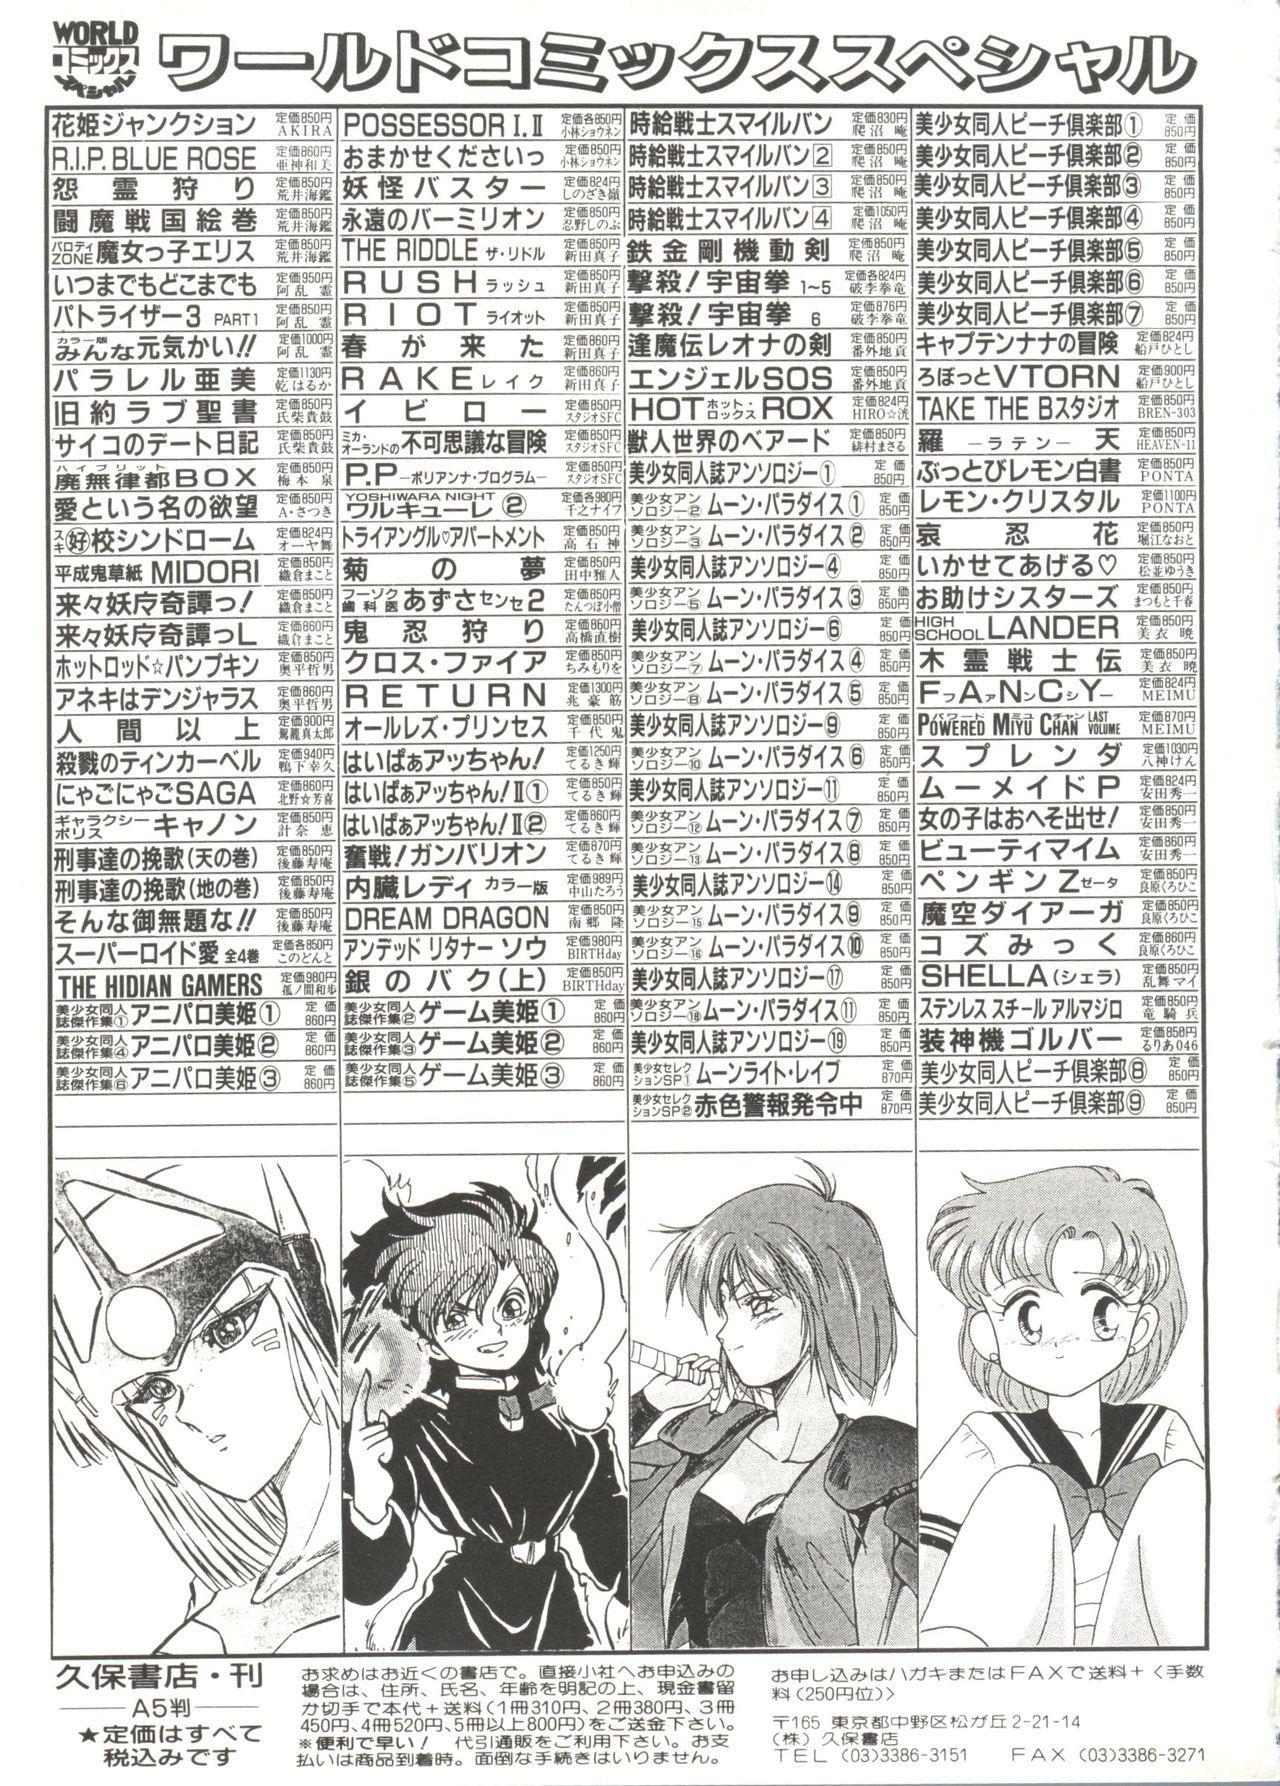 Bishoujo Doujin Peach Club - Pretty Gal's Fanzine Peach Club 9 144